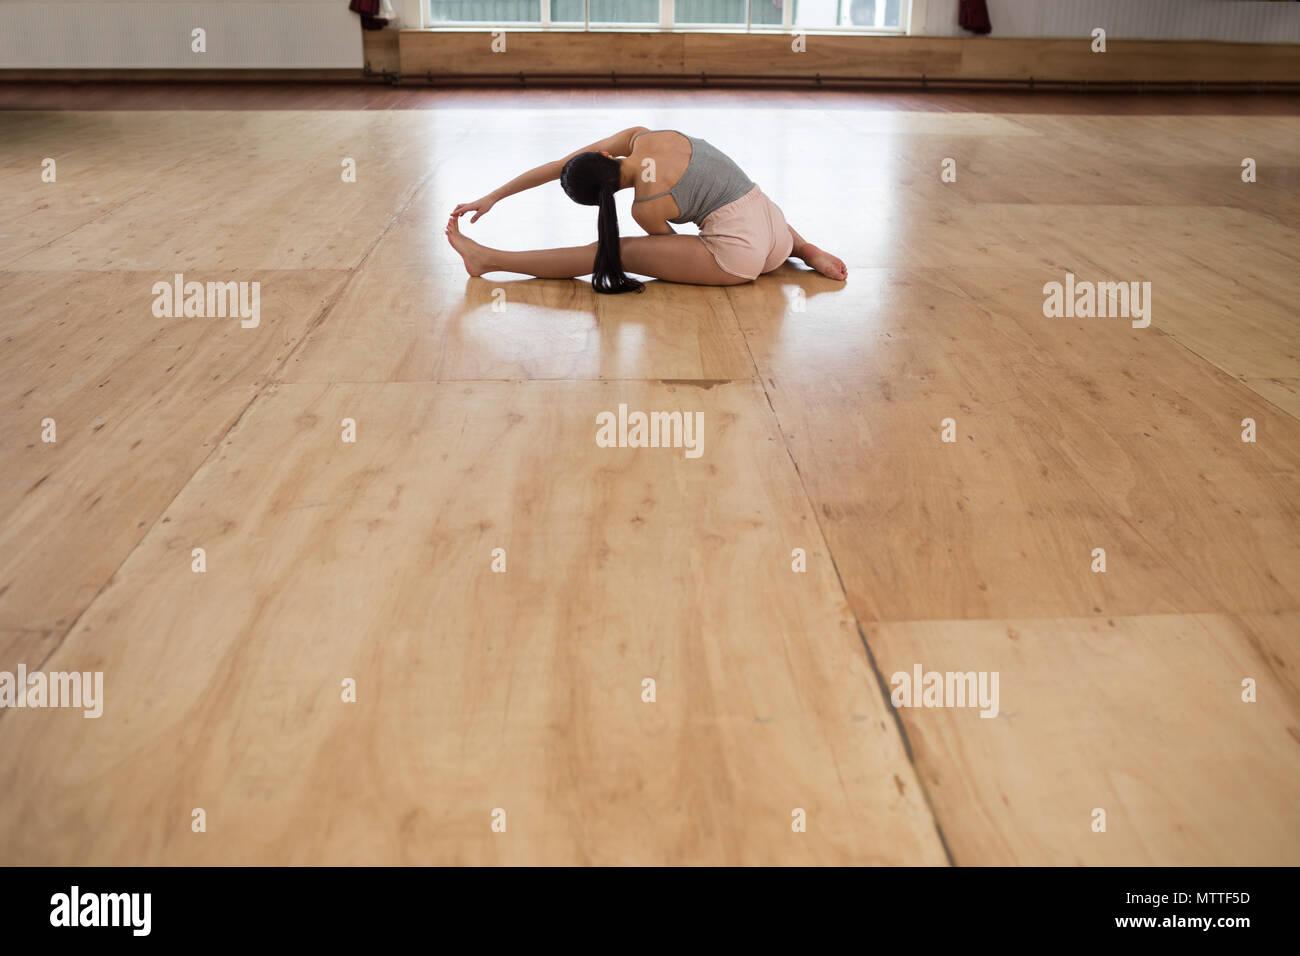 Female dancer exercising in dance studio - Stock Image